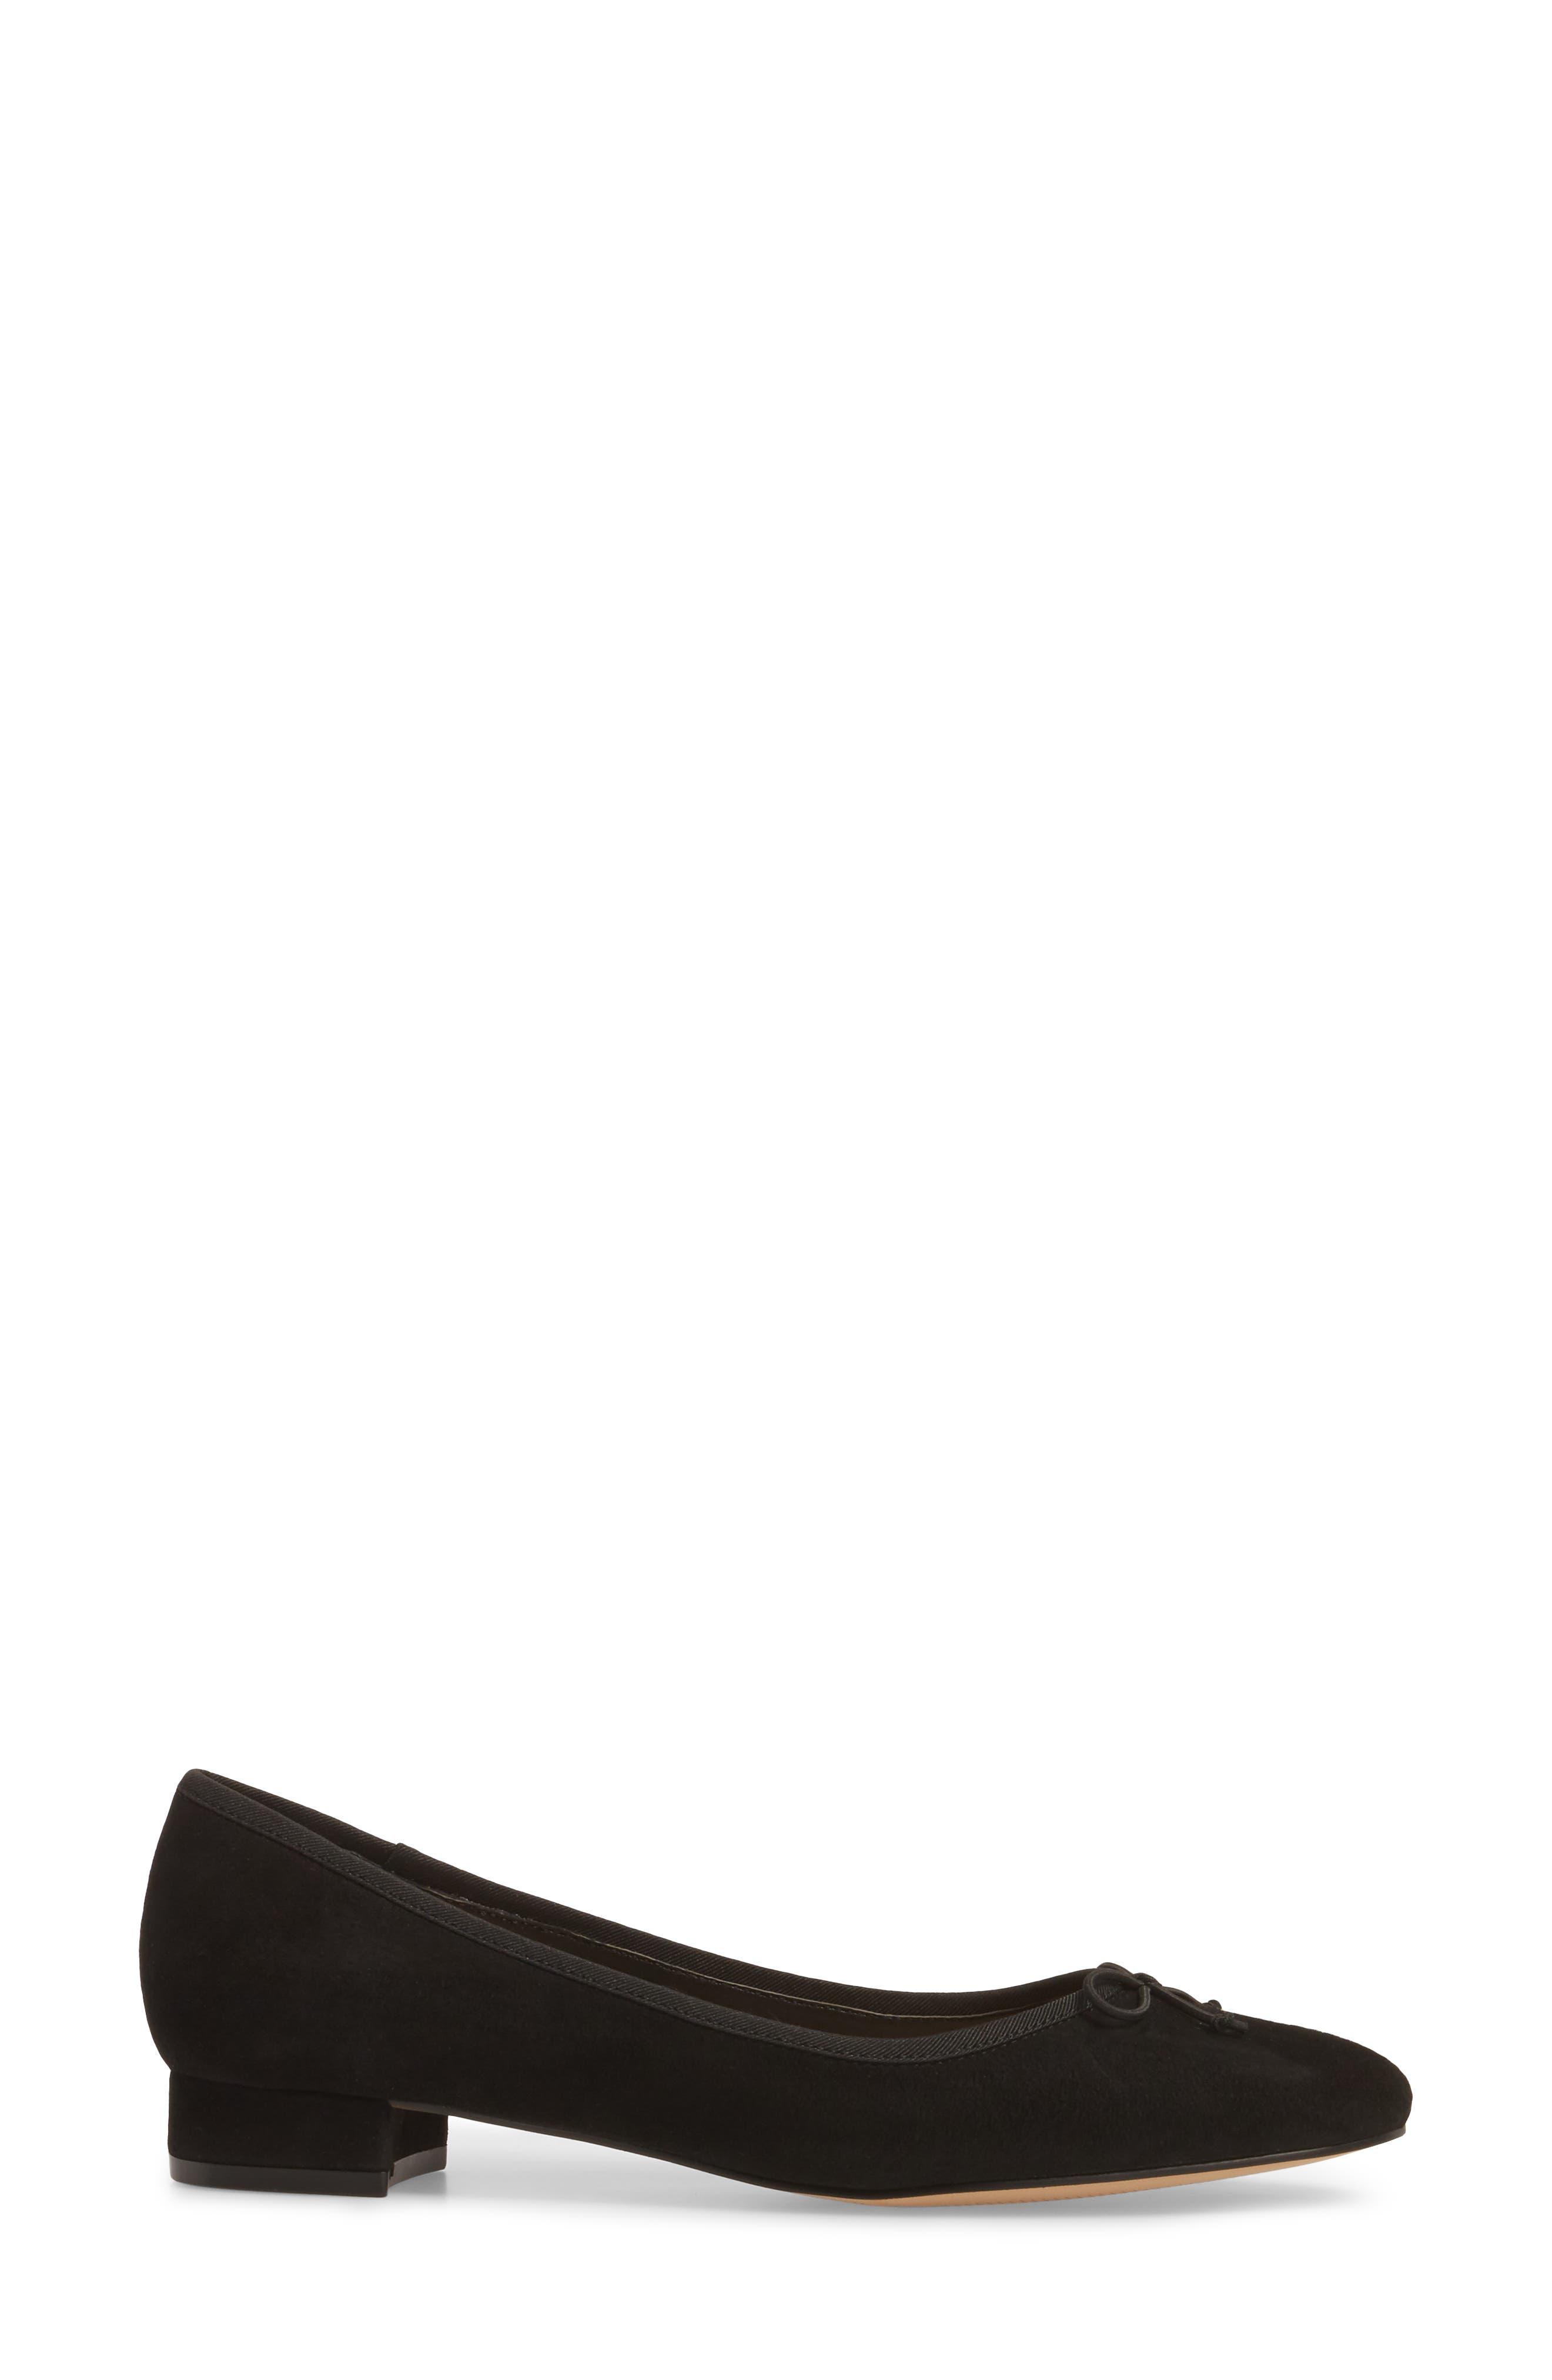 Alternate Image 3  - Sole Society Anastasi Block Heel Flat (Women)